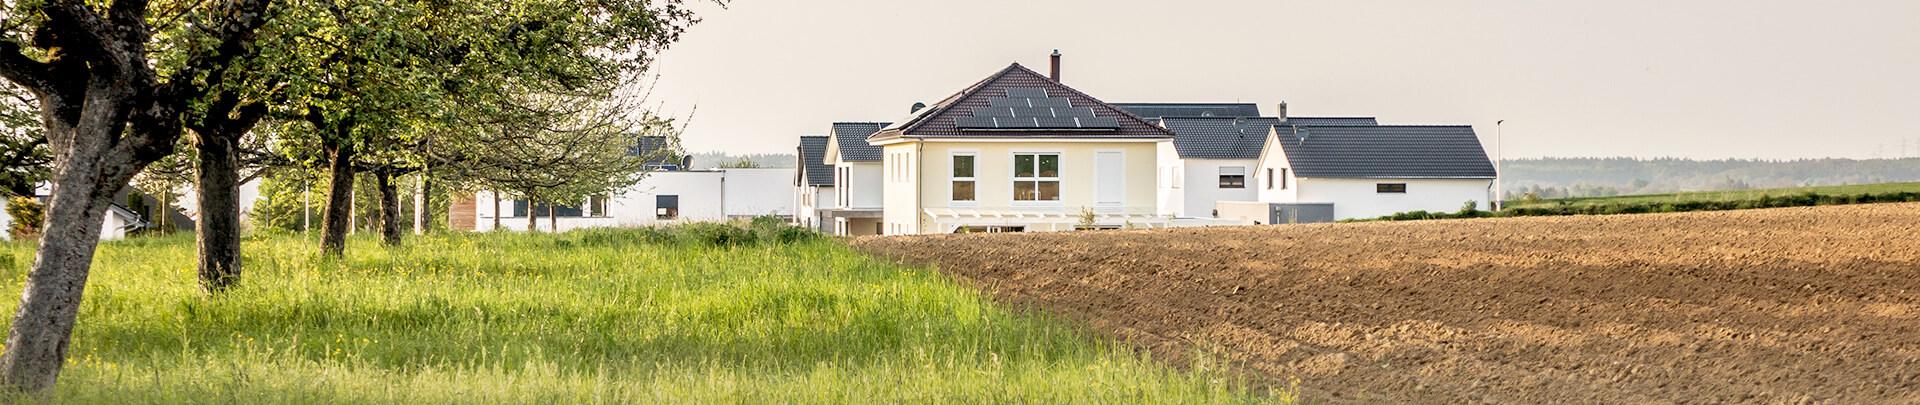 Grundstücksverkauf